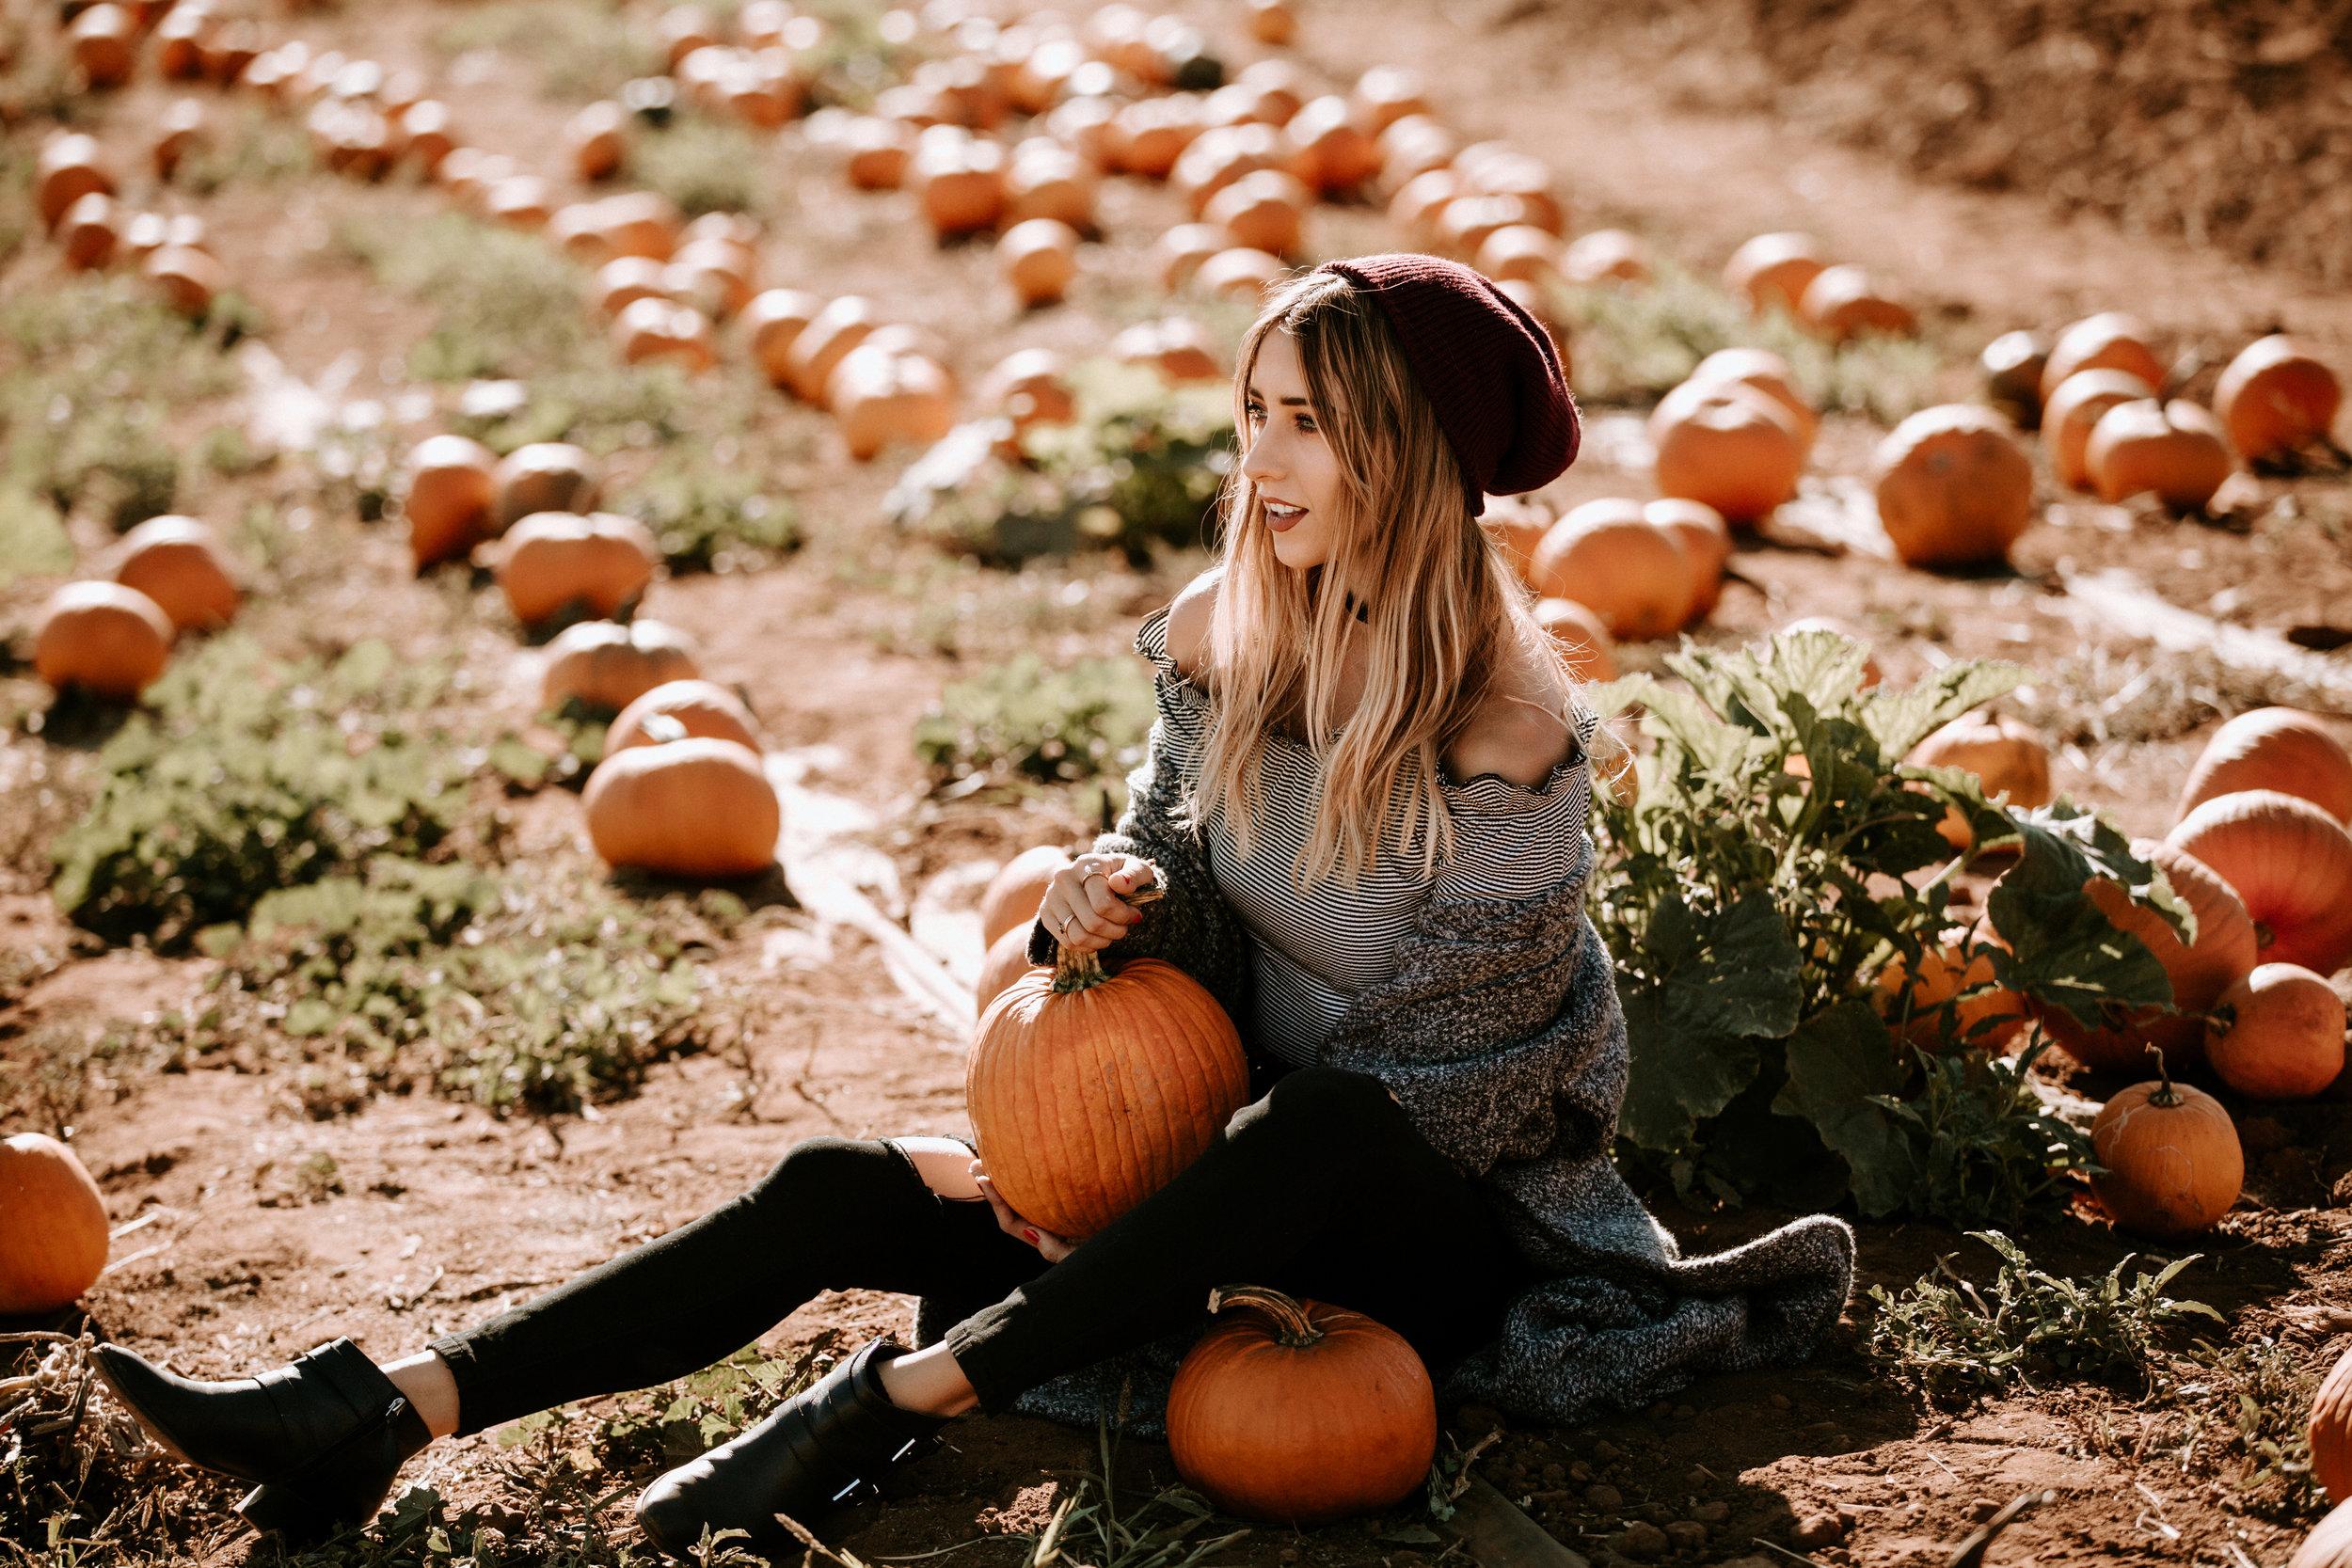 2017-10-16_Lindsey Carlene_Pumpkin Patch_HR-6.jpg